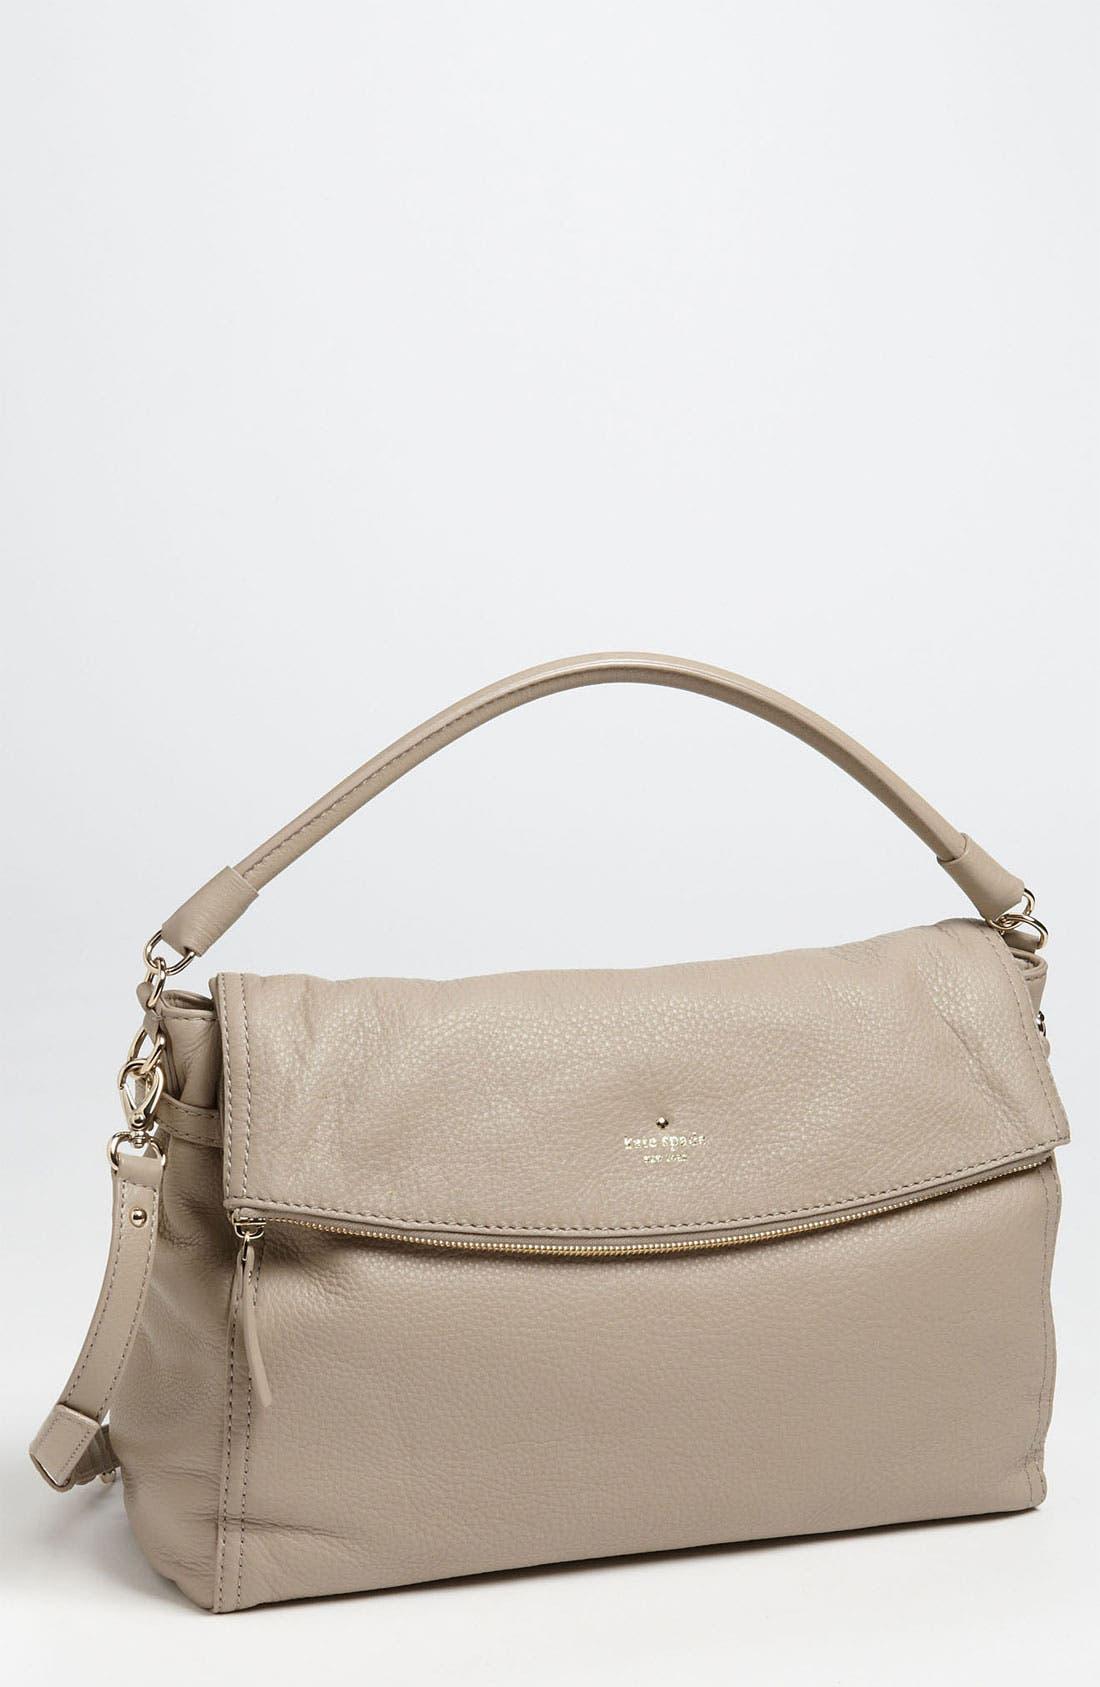 Alternate Image 1 Selected - kate spade new york 'cobble hill - minka' shoulder bag